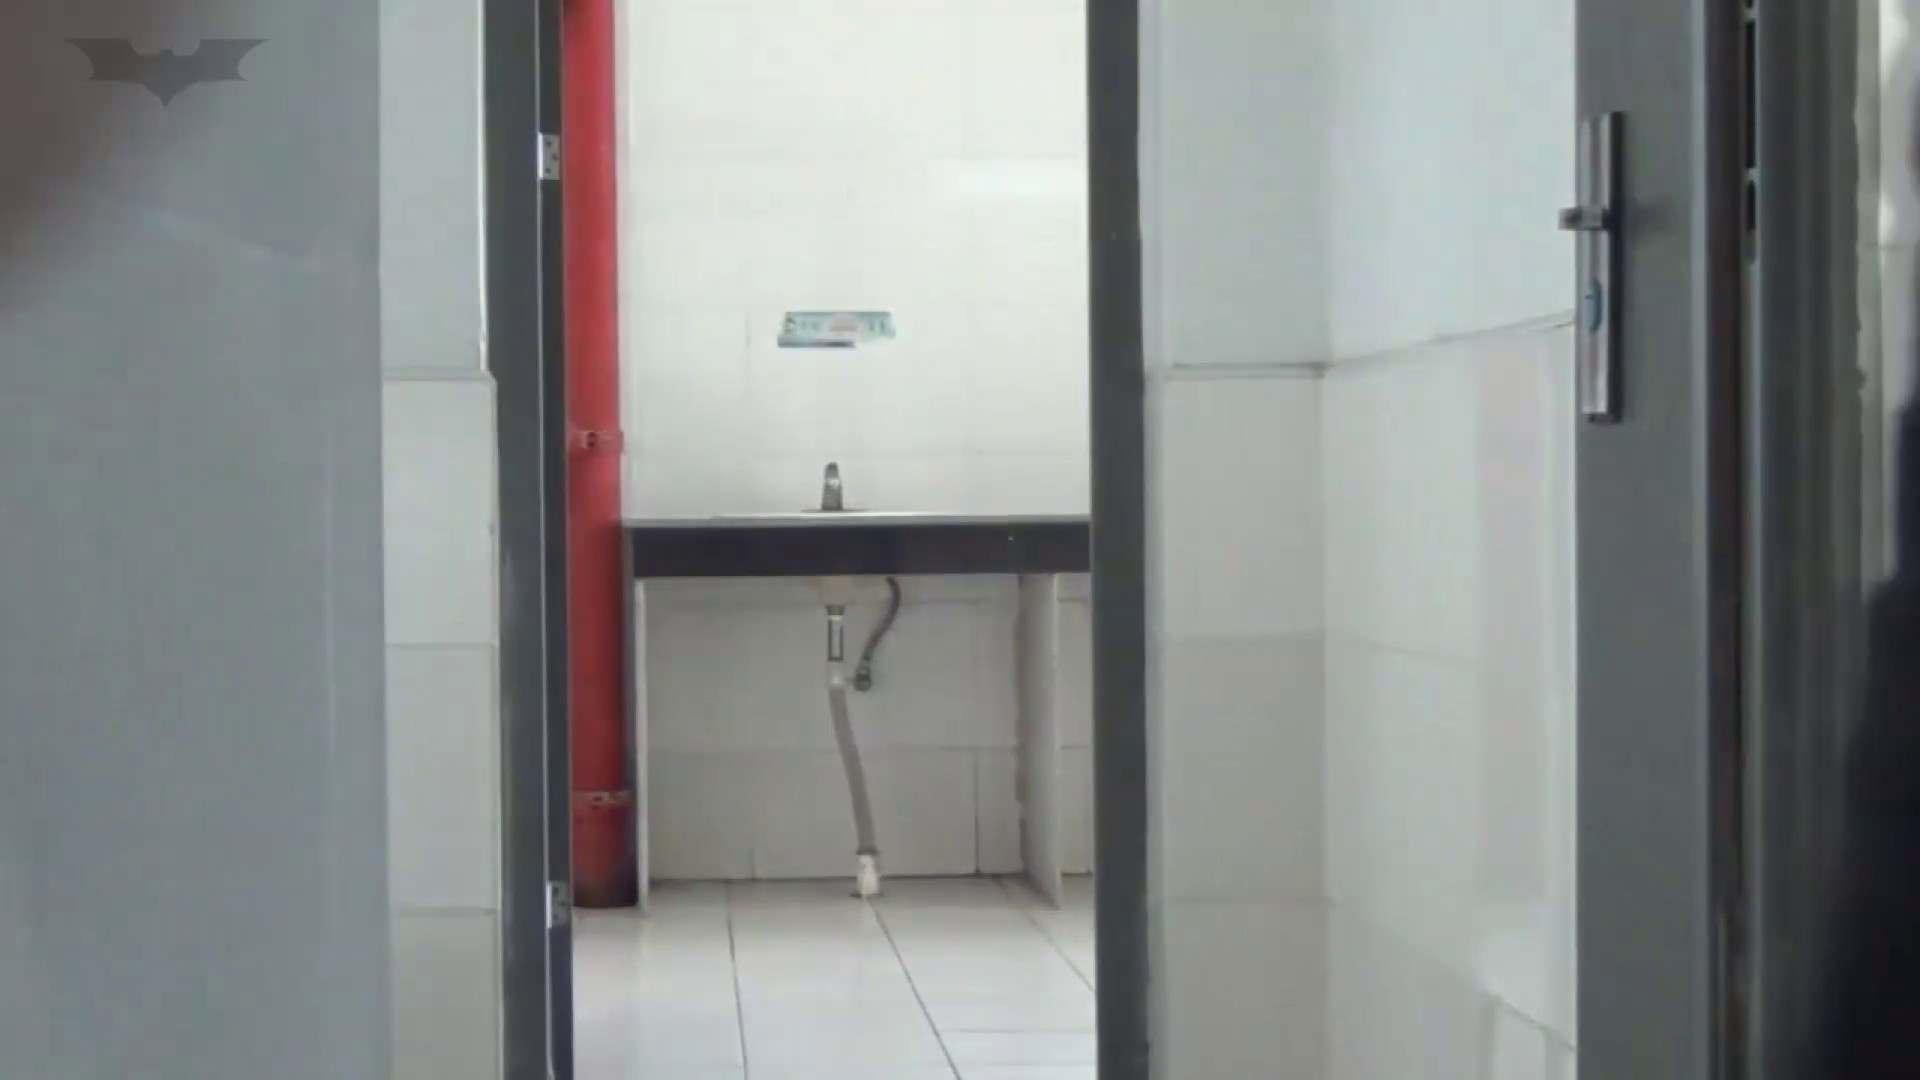 JD盗撮 美女の洗面所の秘密 Vol.33 トイレのぞき AV動画キャプチャ 68画像 43